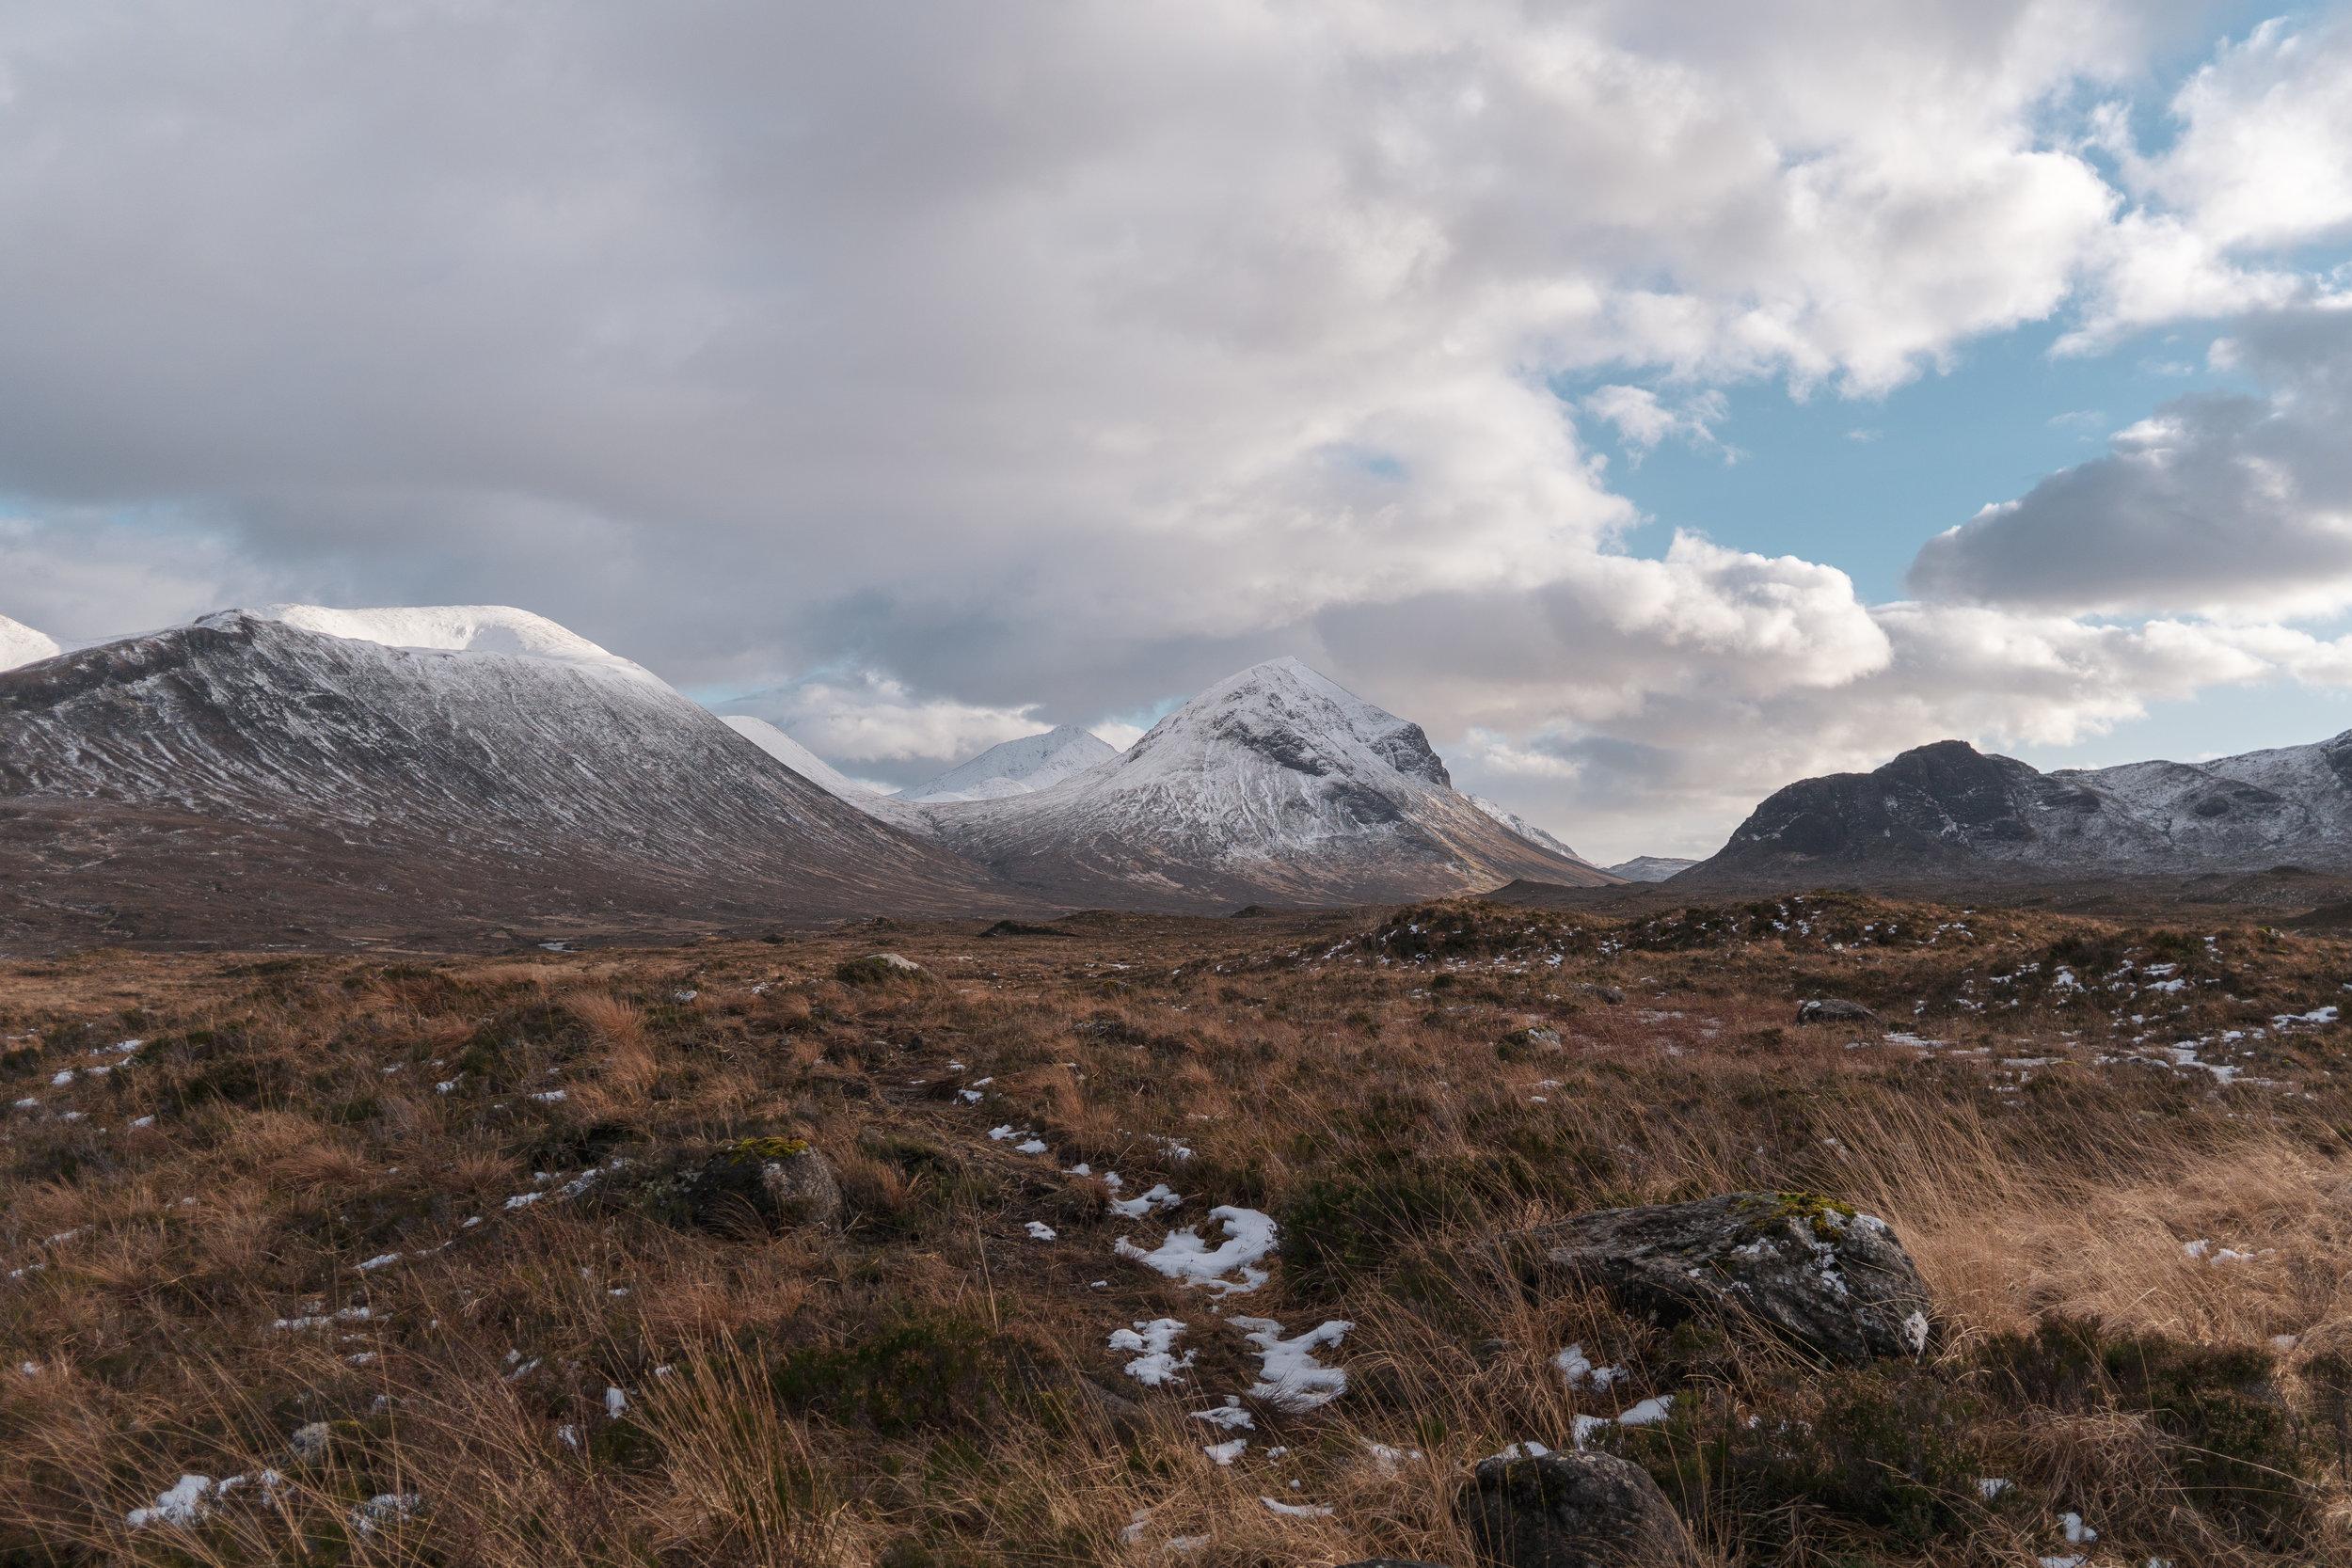 Isle-of-Skye-Fairy-Glen-und-Braes (31).jpg